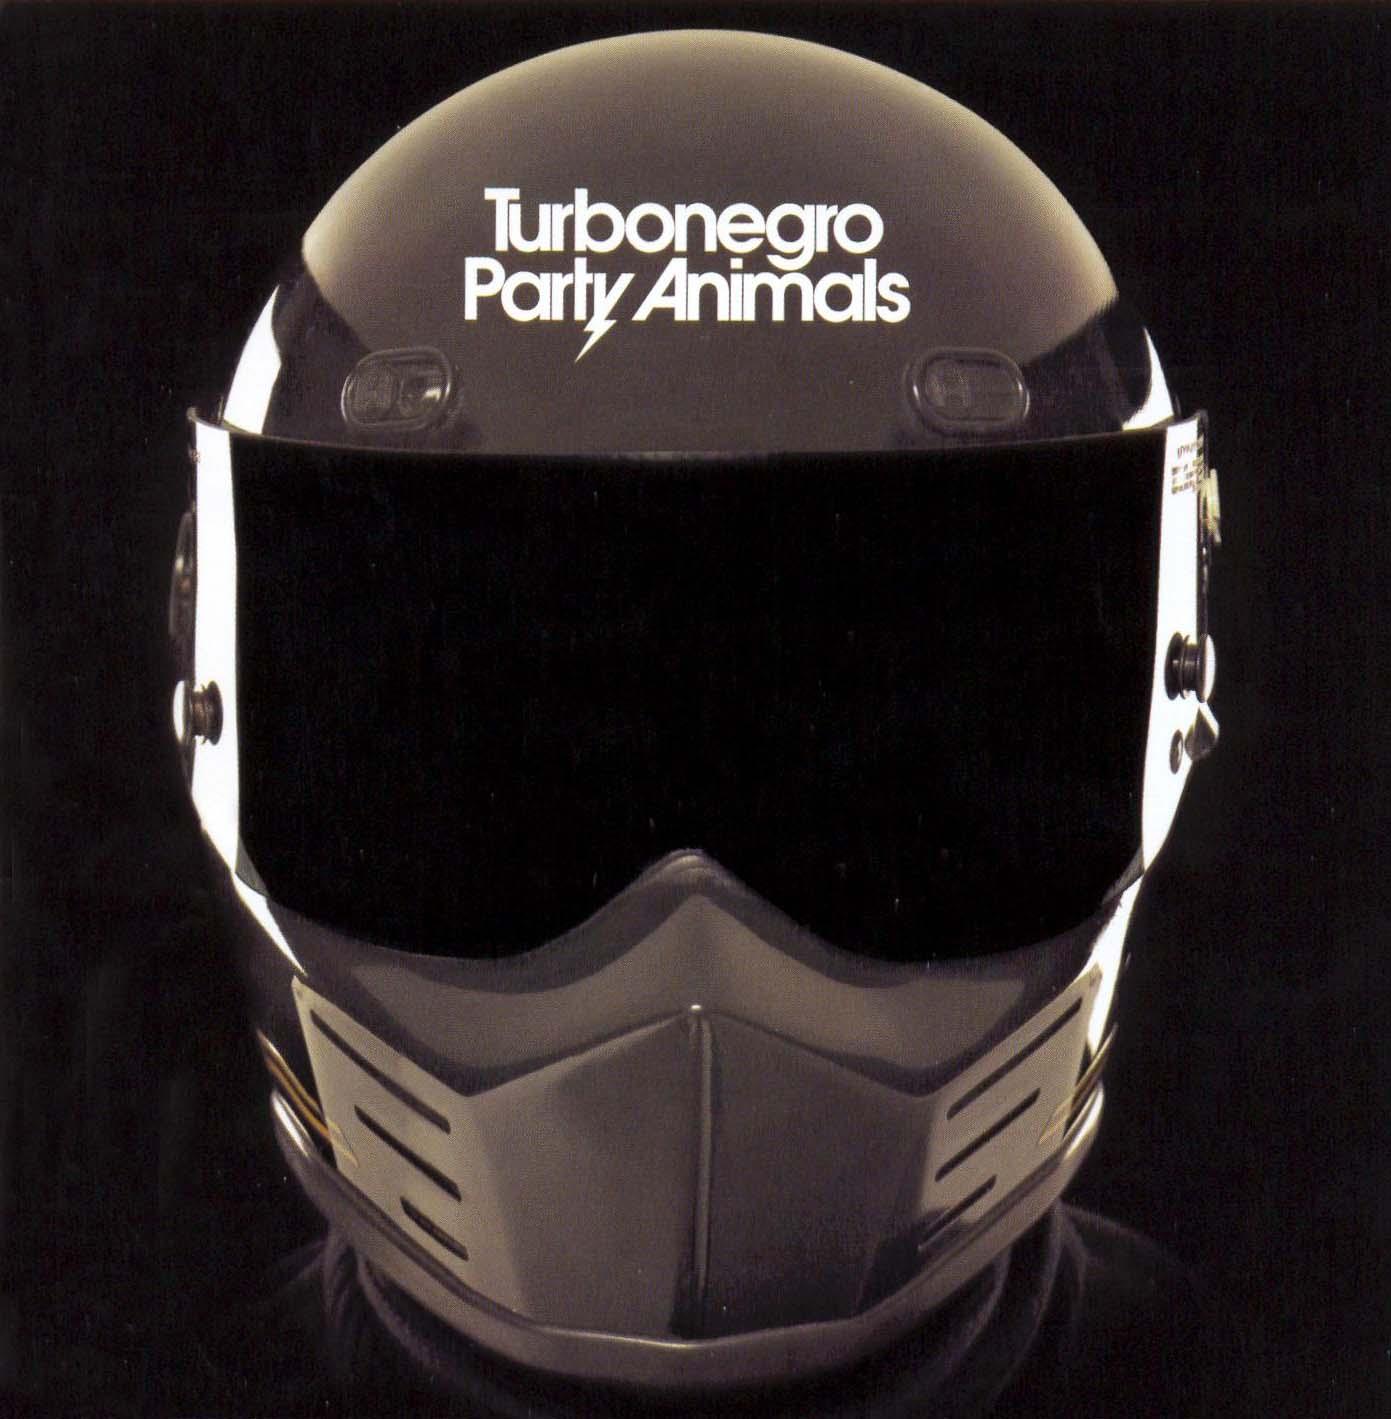 Turbonegro: Party Animals